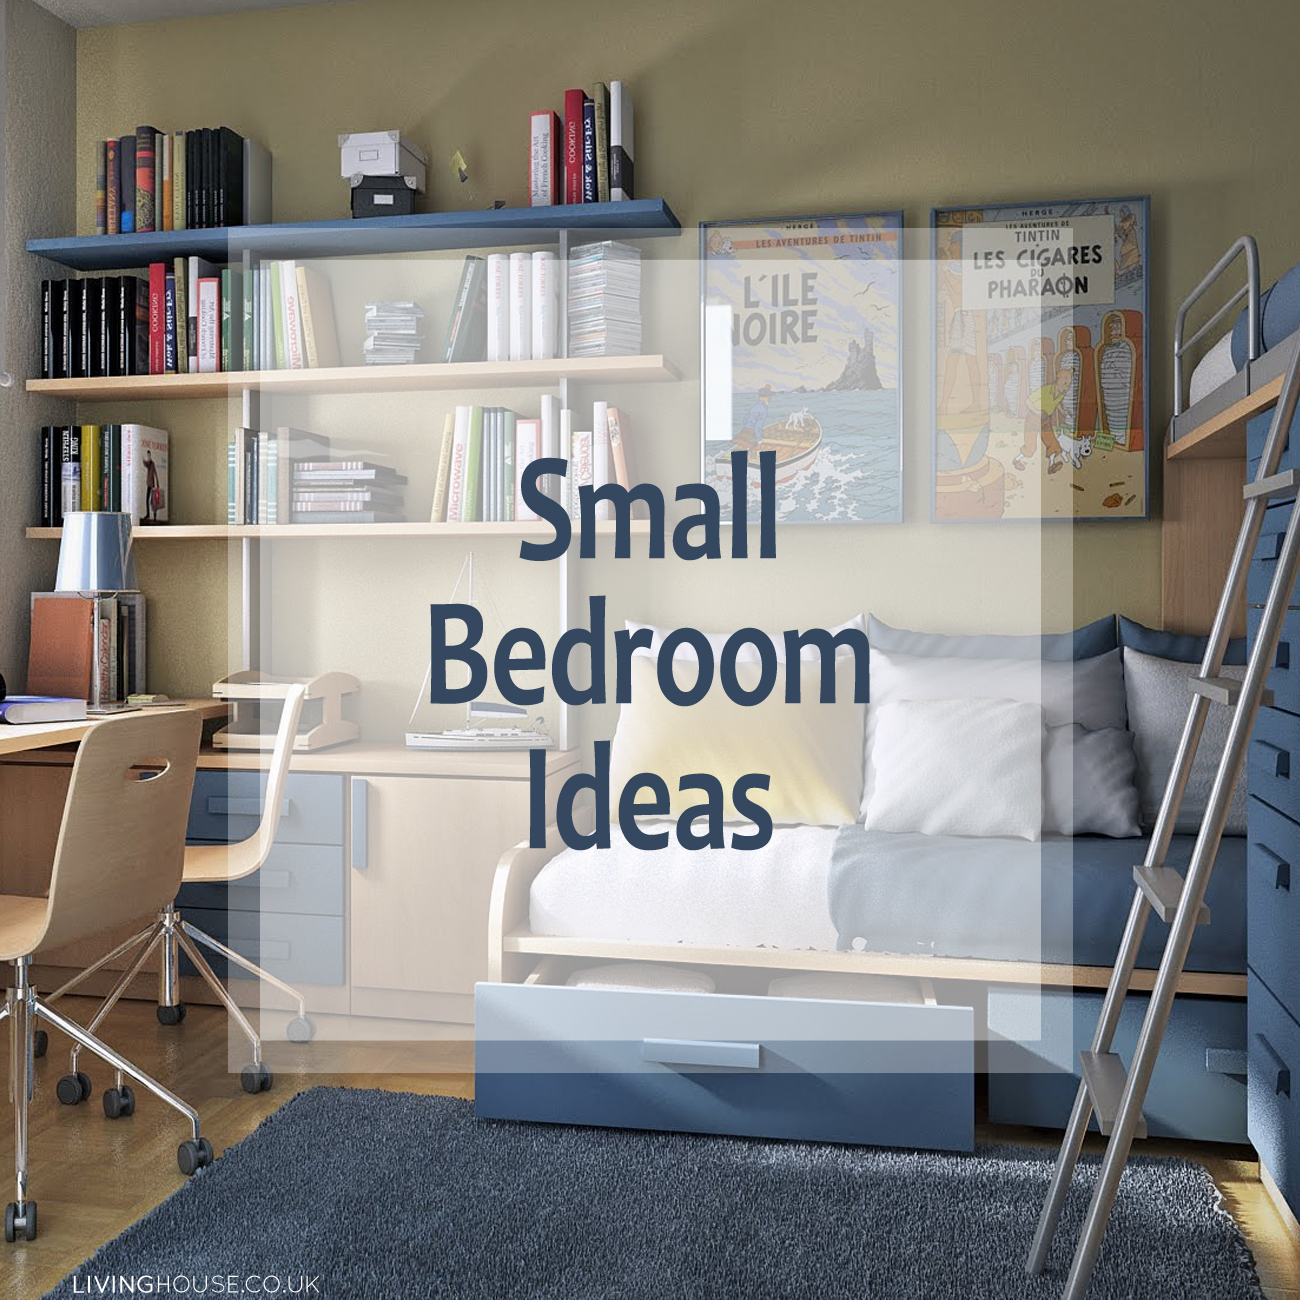 Small Bathroom Ideas - livinghouse.co.uk